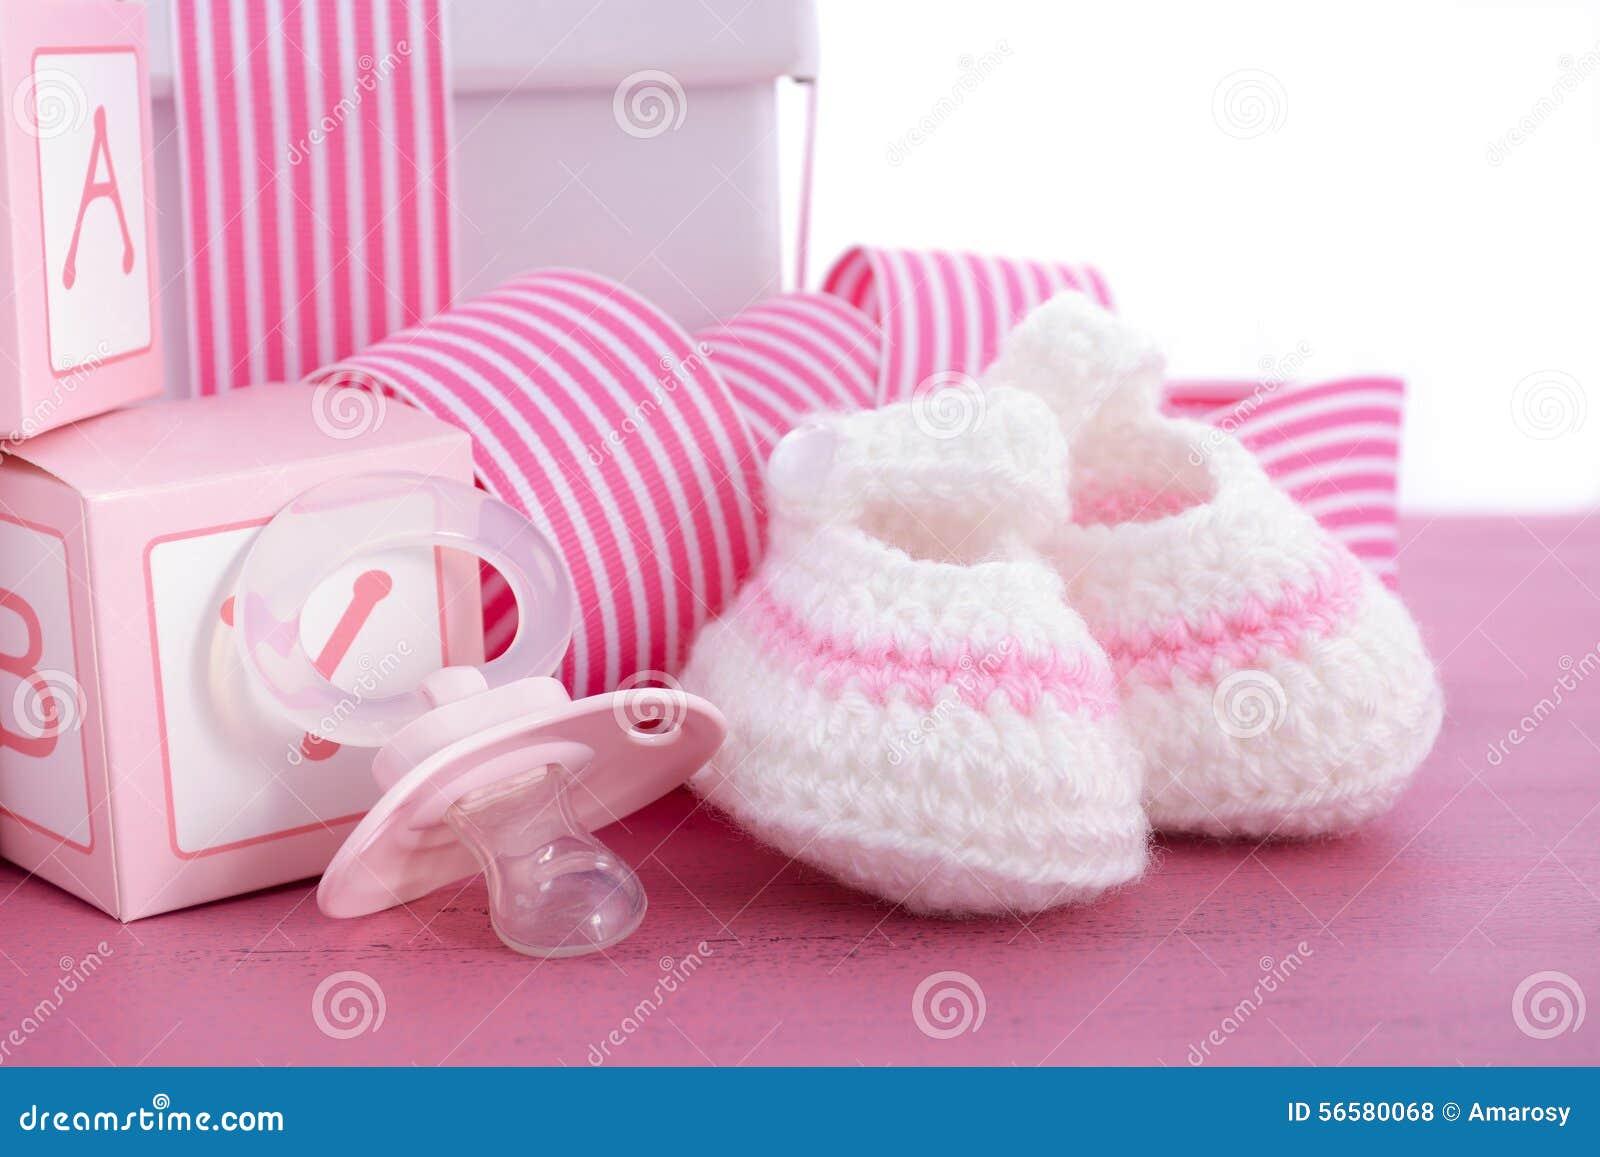 pink pacifier baby girl shower card royaltyfree cartoon